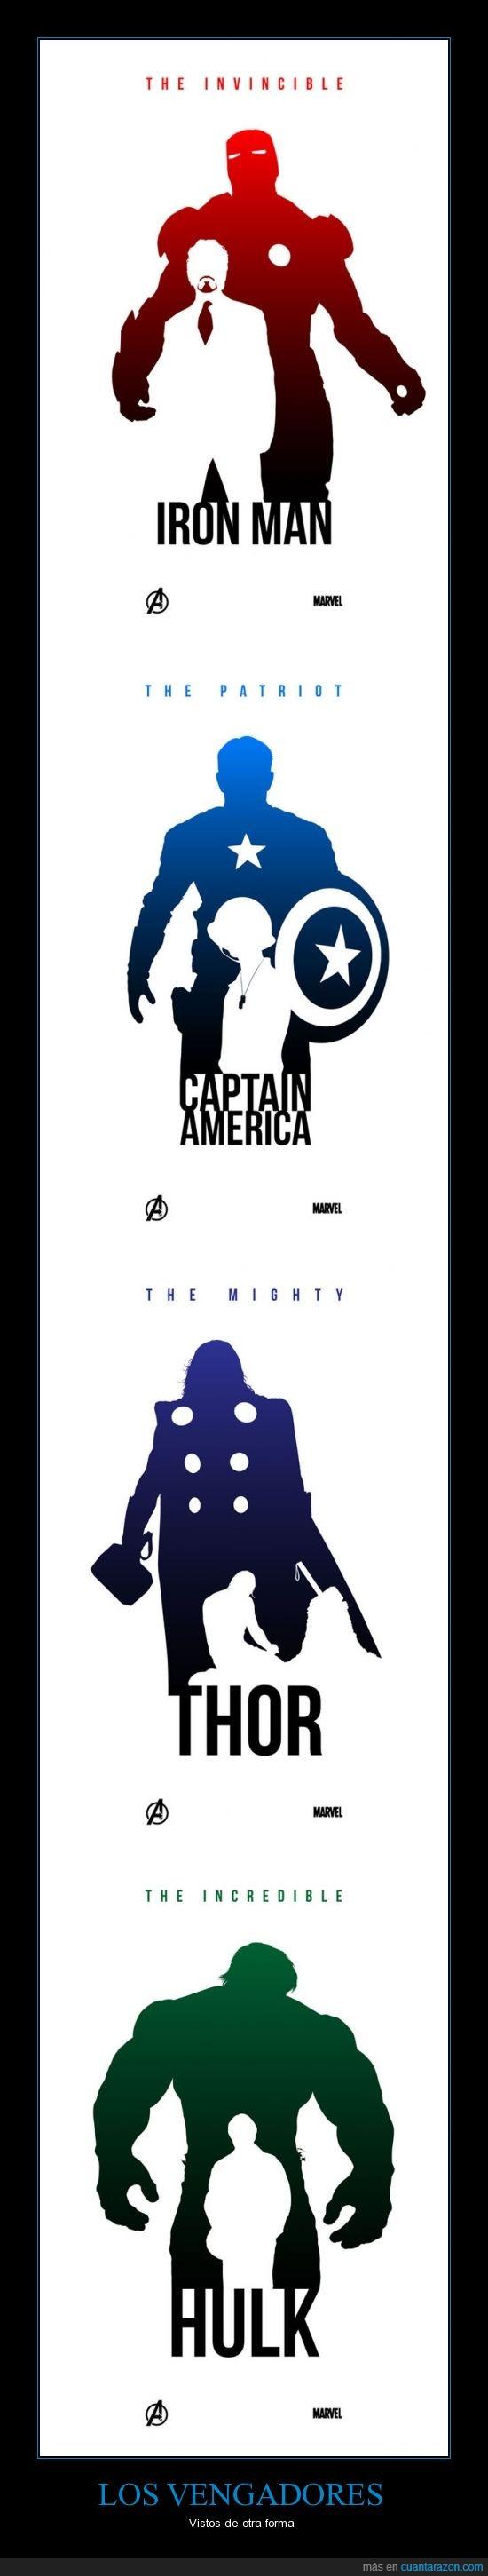 america,avengers,capitan,hulk,ironman,marvel,thor